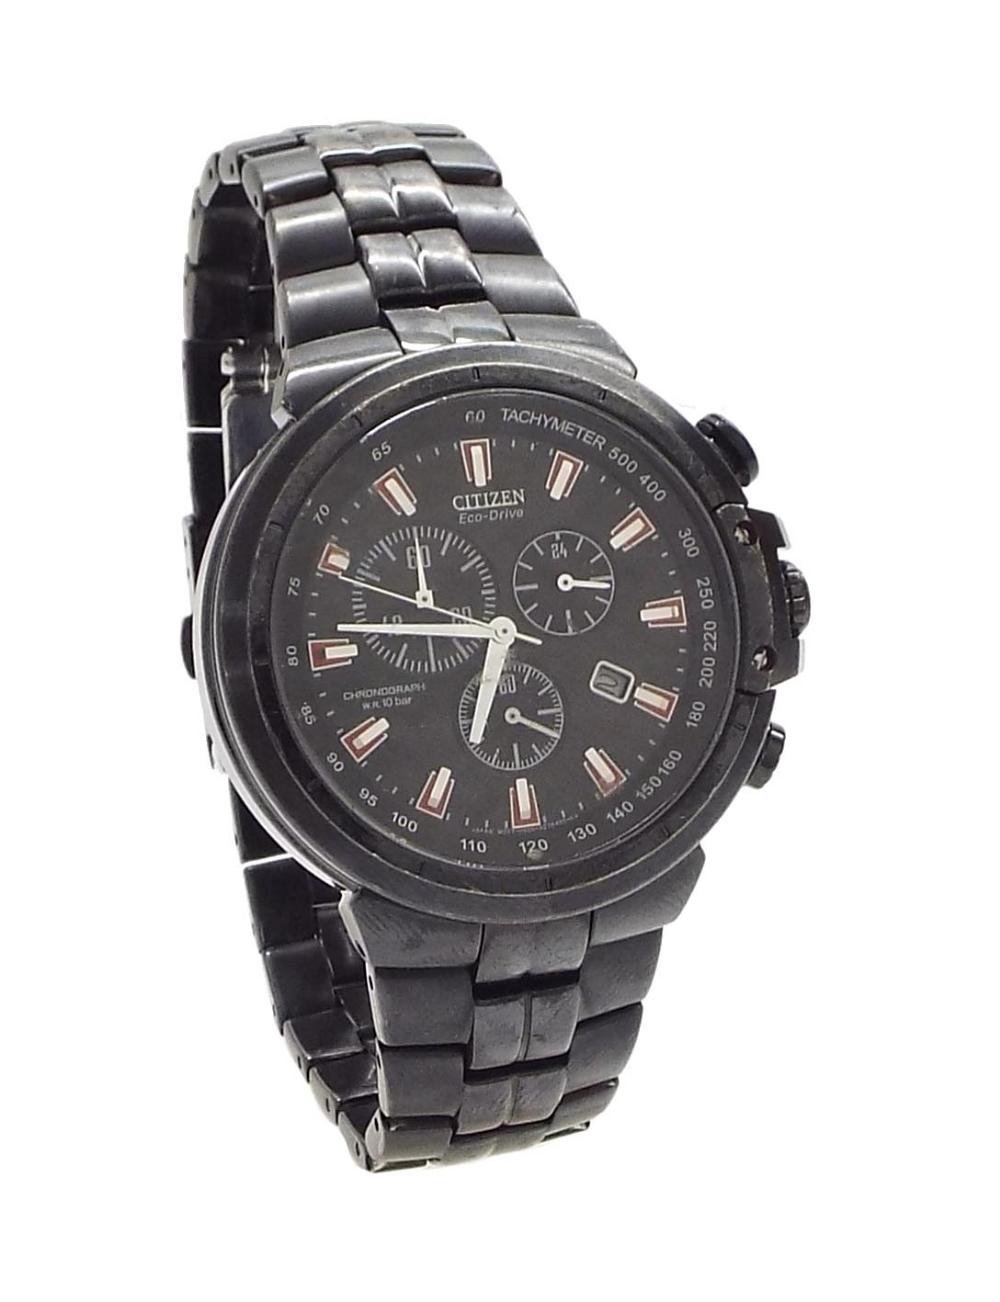 Lot 392 Citizen Eco Drive W R 10 Bar Chronograph Black Stainless Steel Gentleman